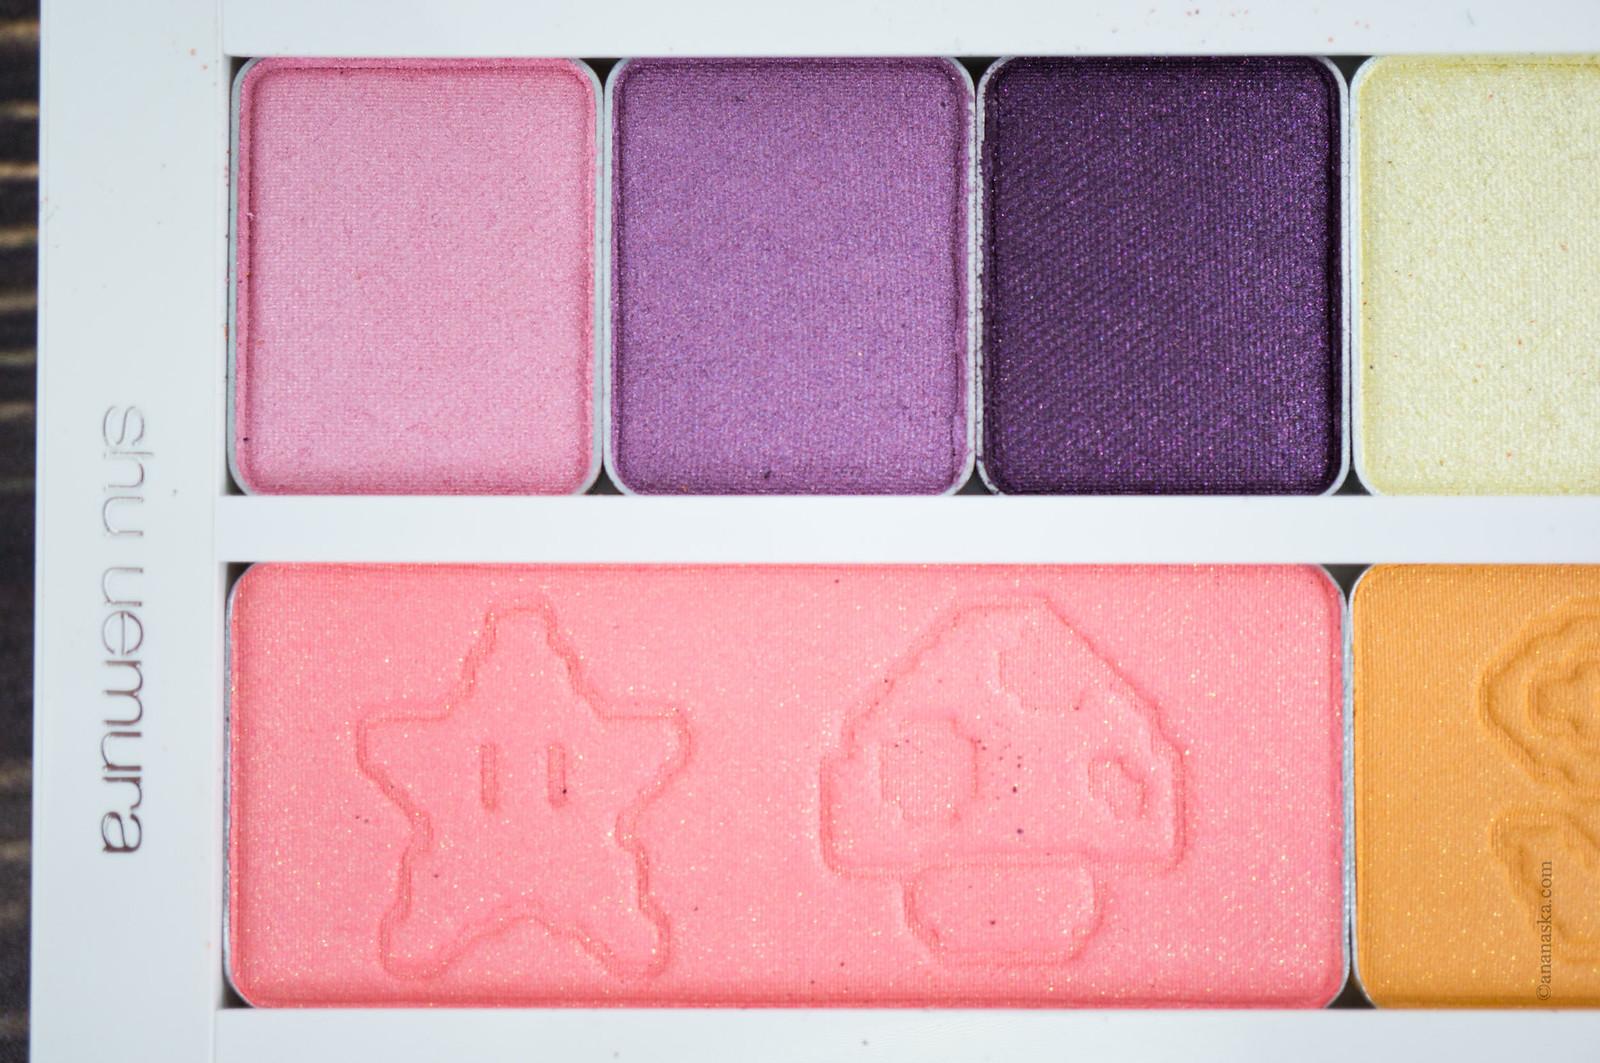 Shu Uemura x Super Mario Bros Eye & Cheek Palette